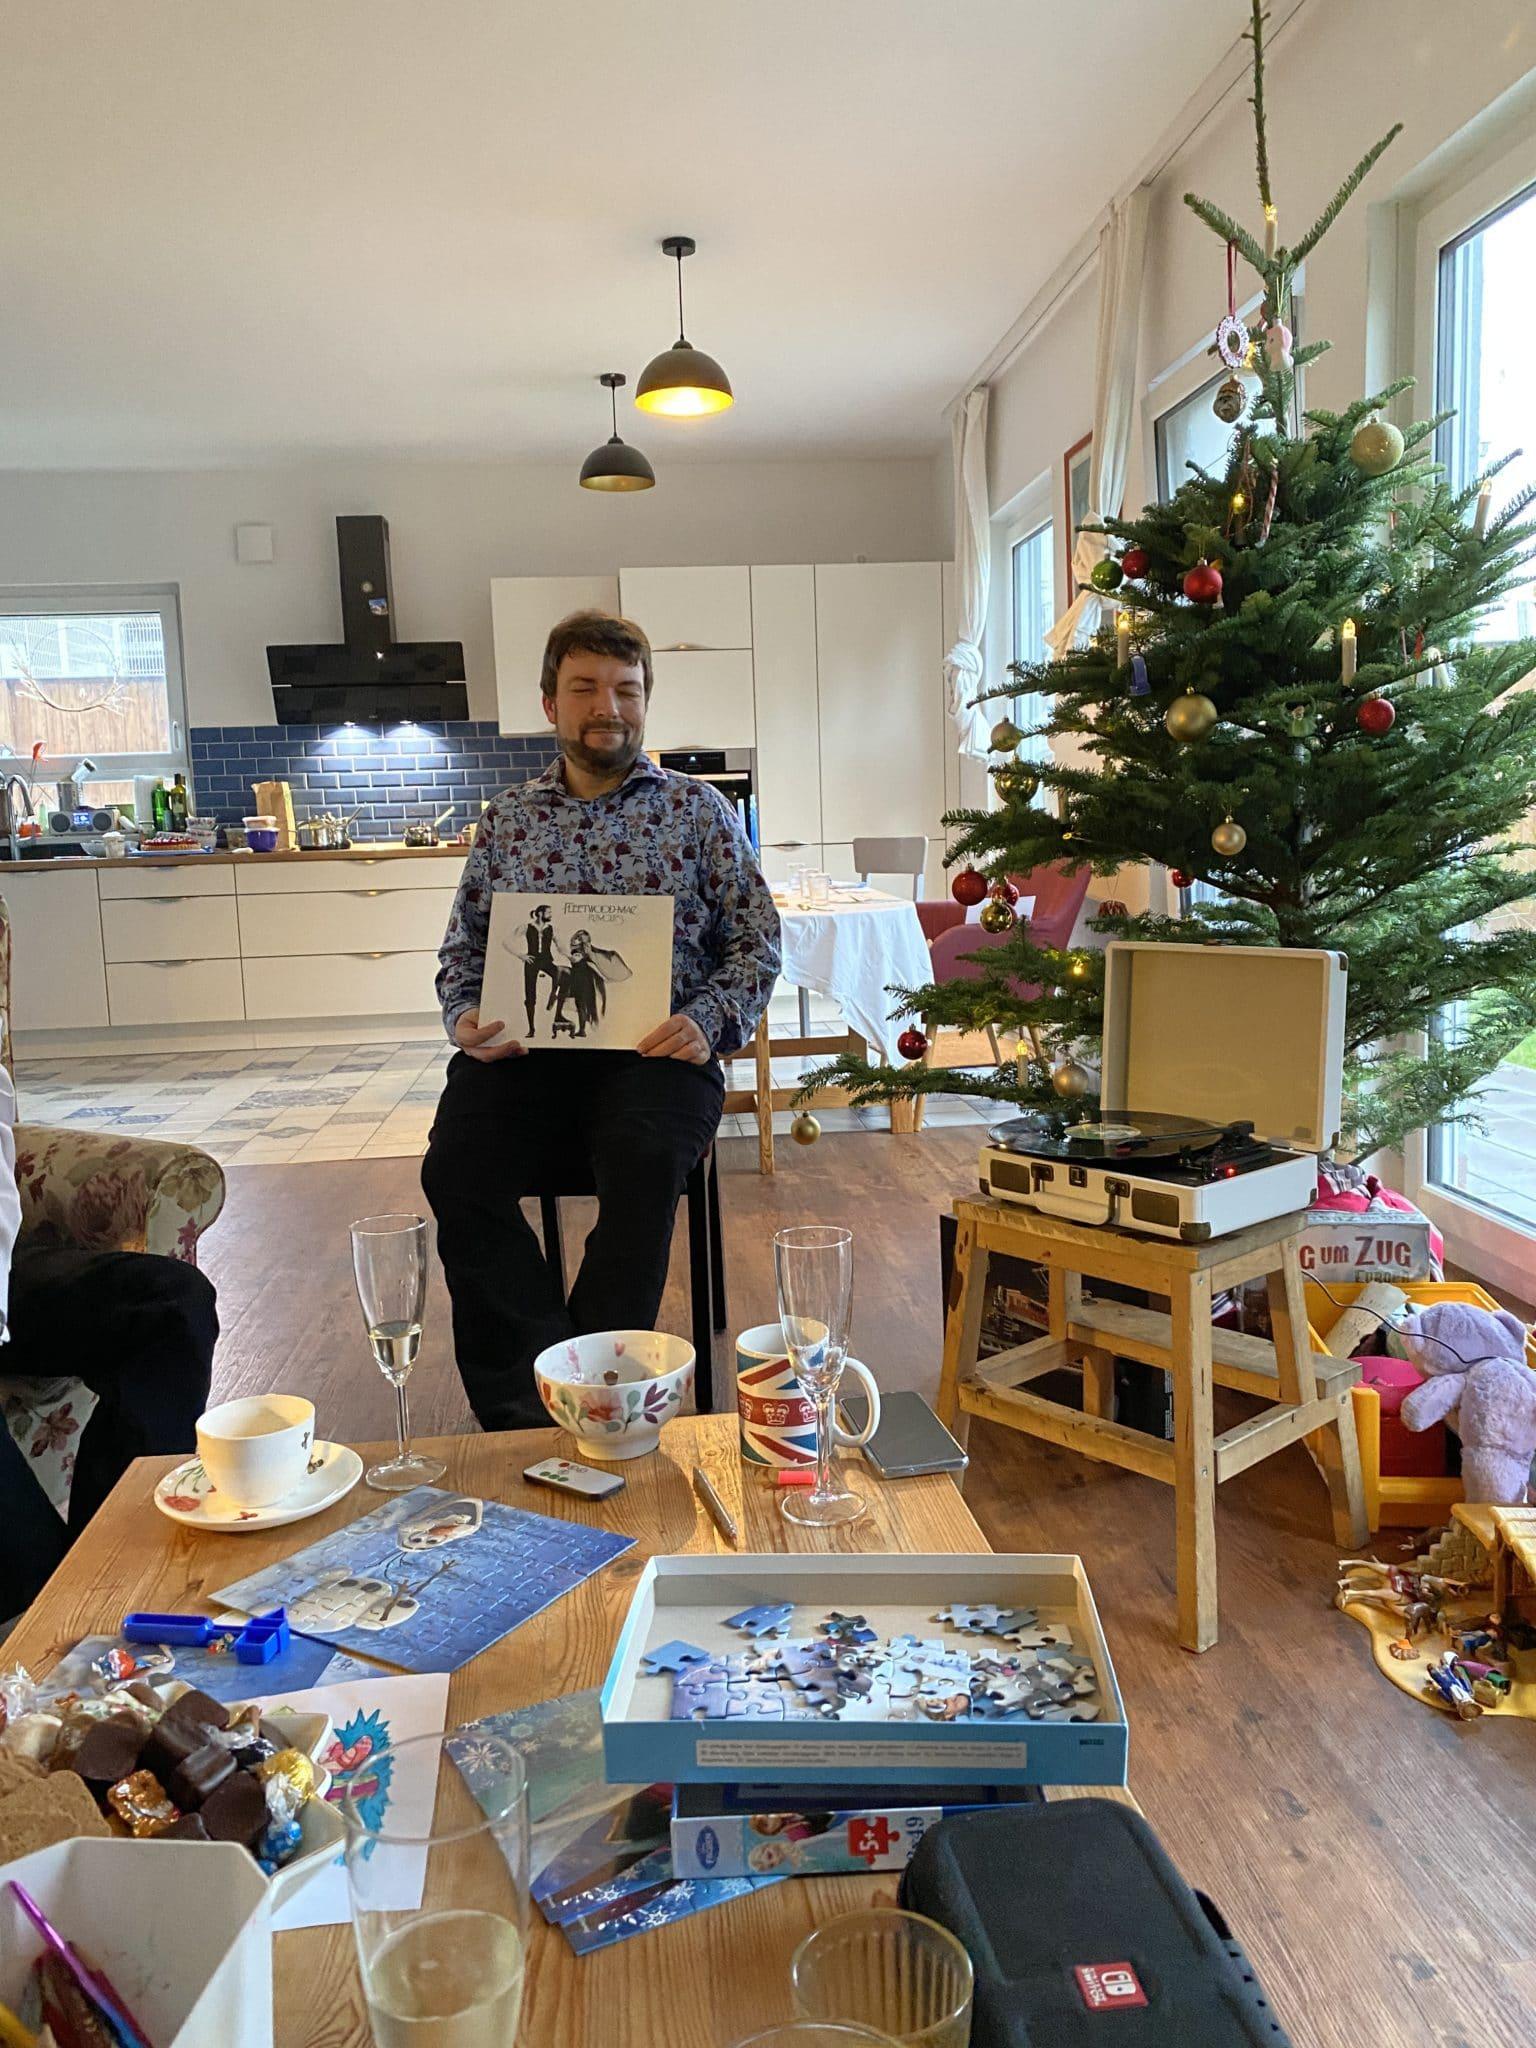 Weihnachten in Bildern_Coronazeit_grossekoepfe